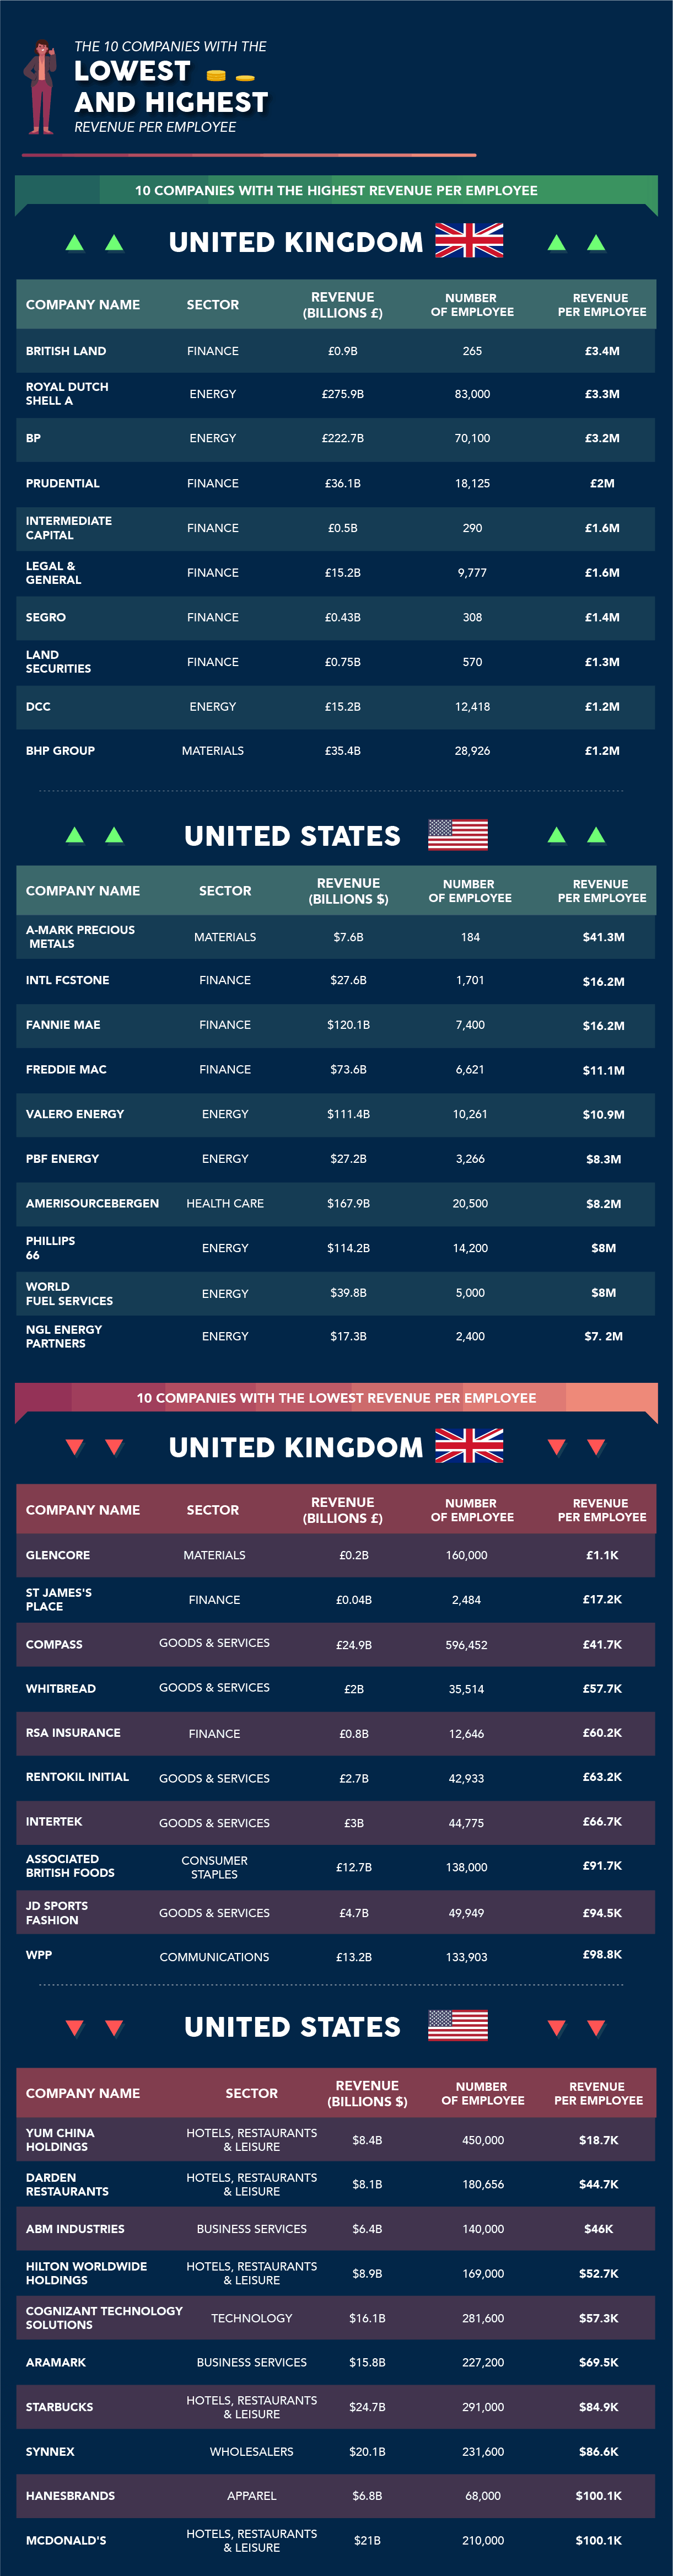 Top Uk companies by revenue per employee